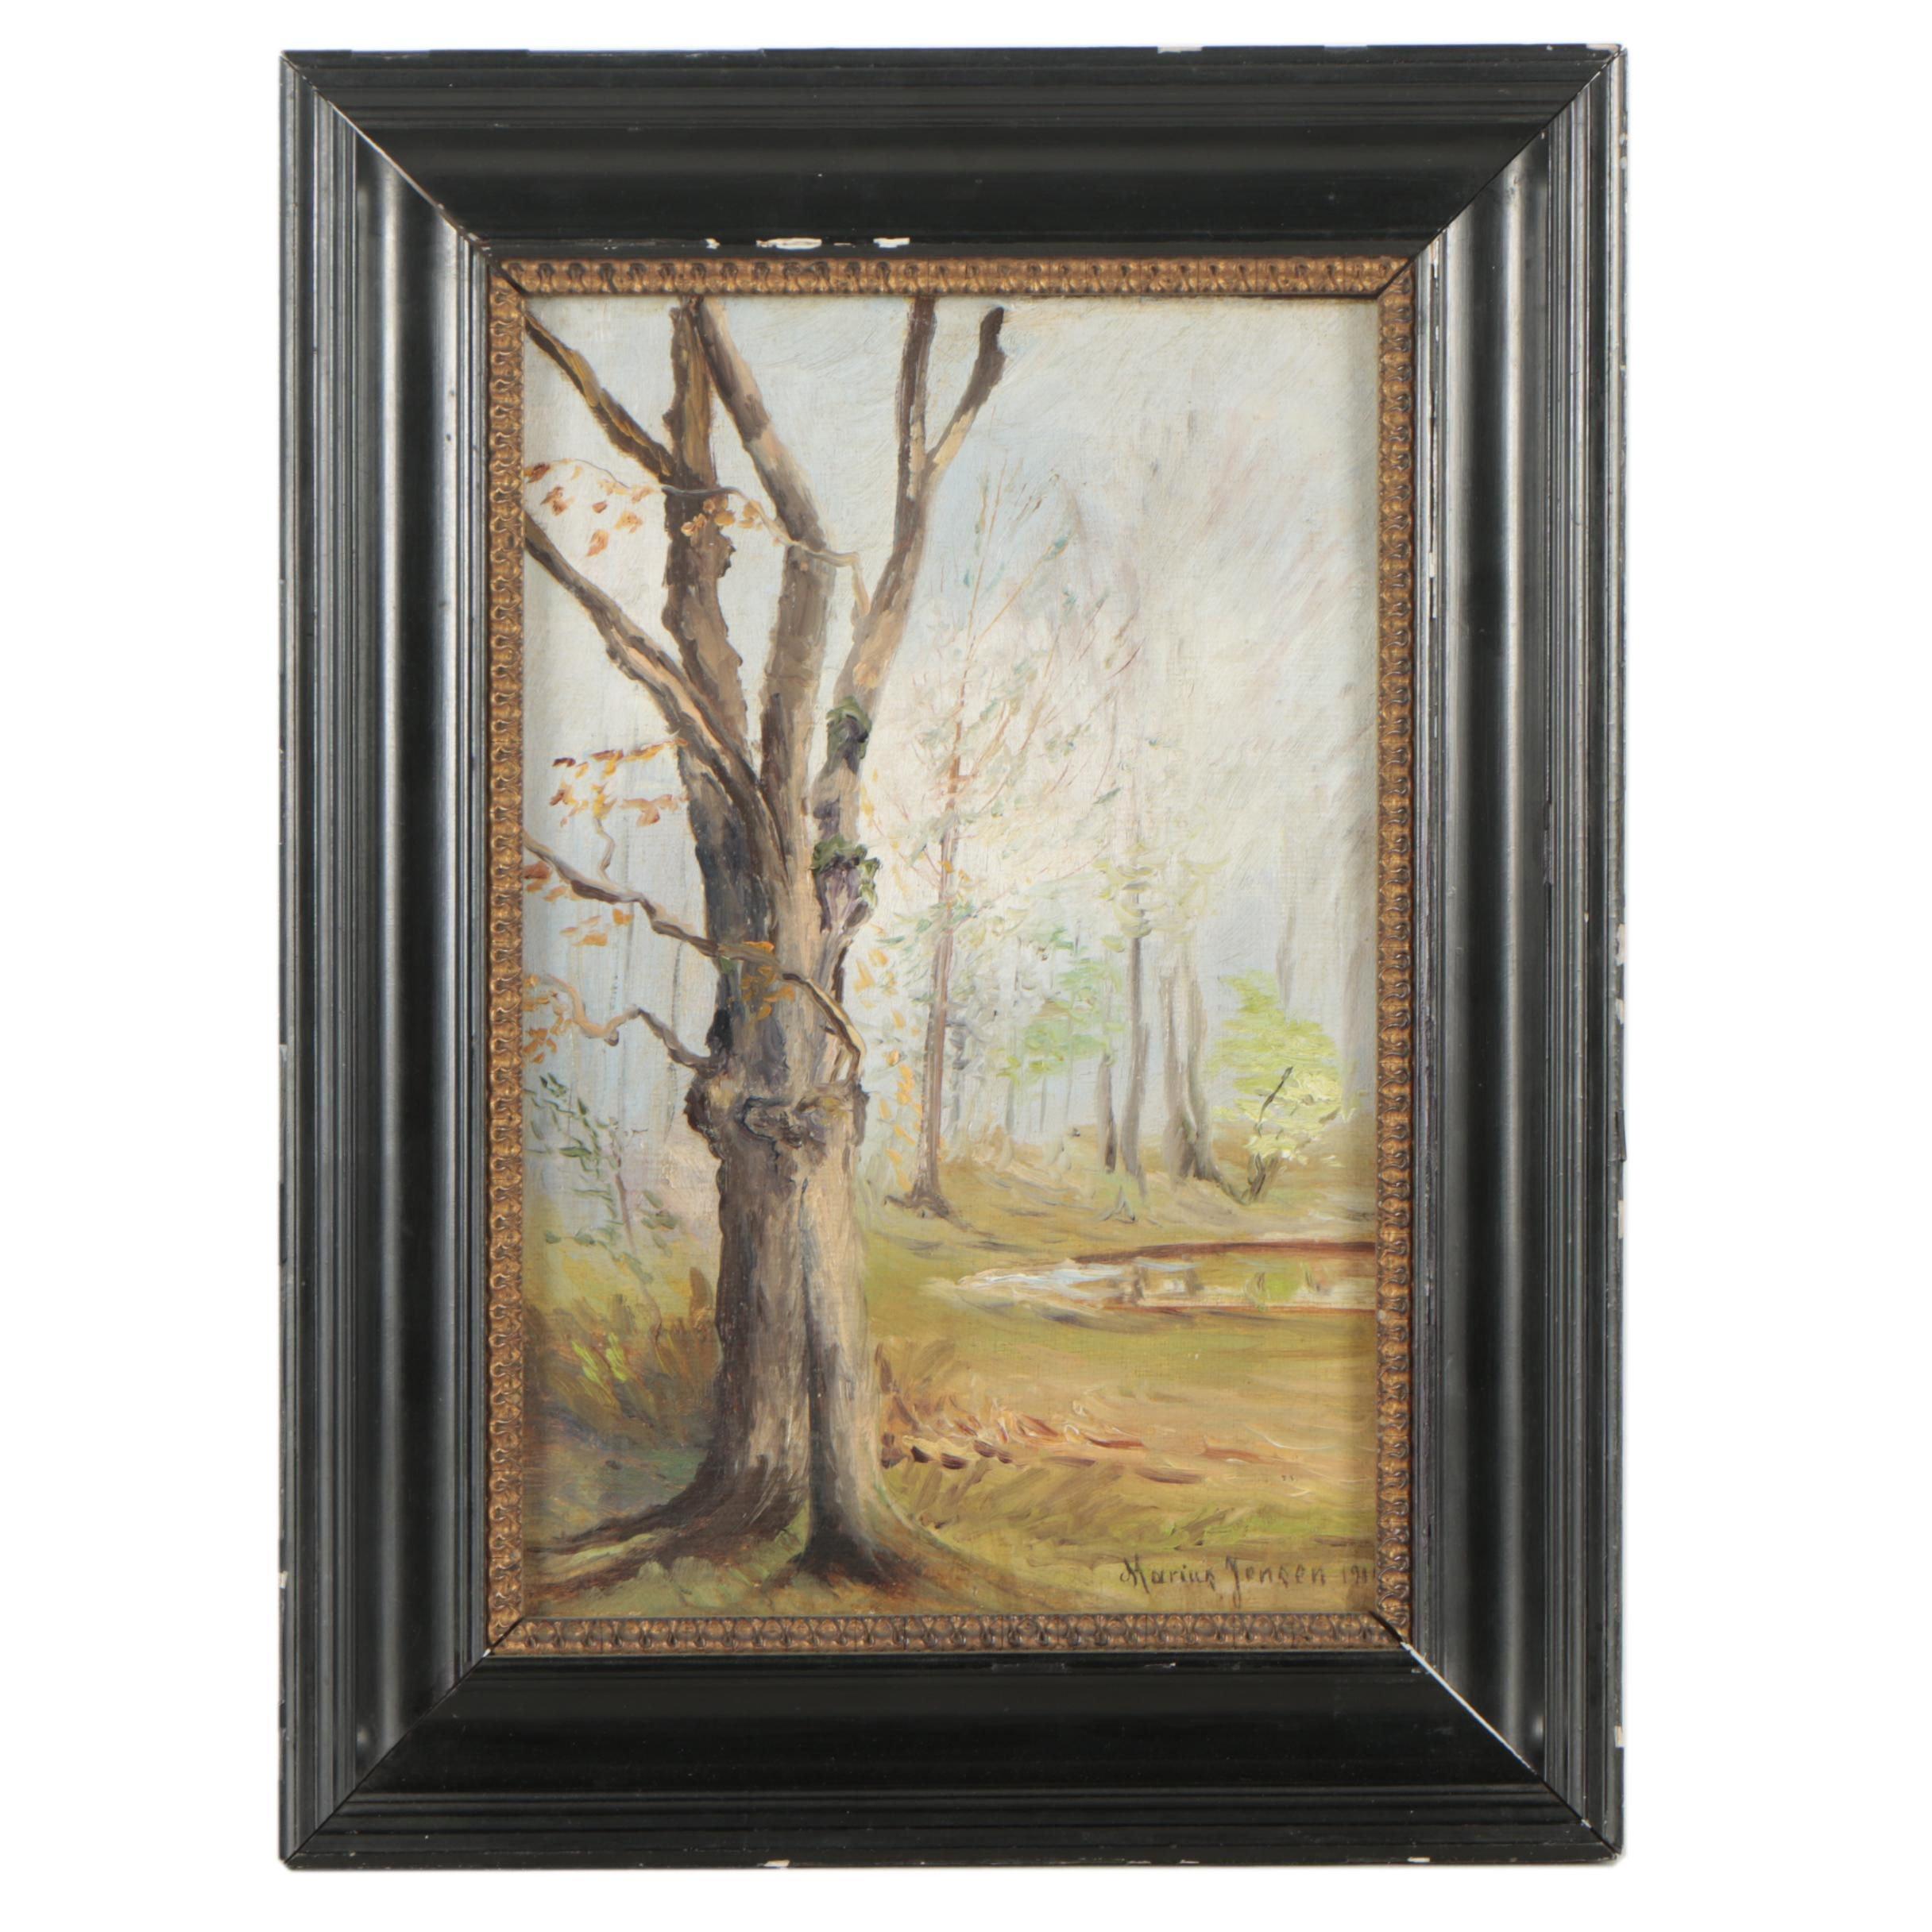 Marius Jensen Oil Painting of a Forest Landscape